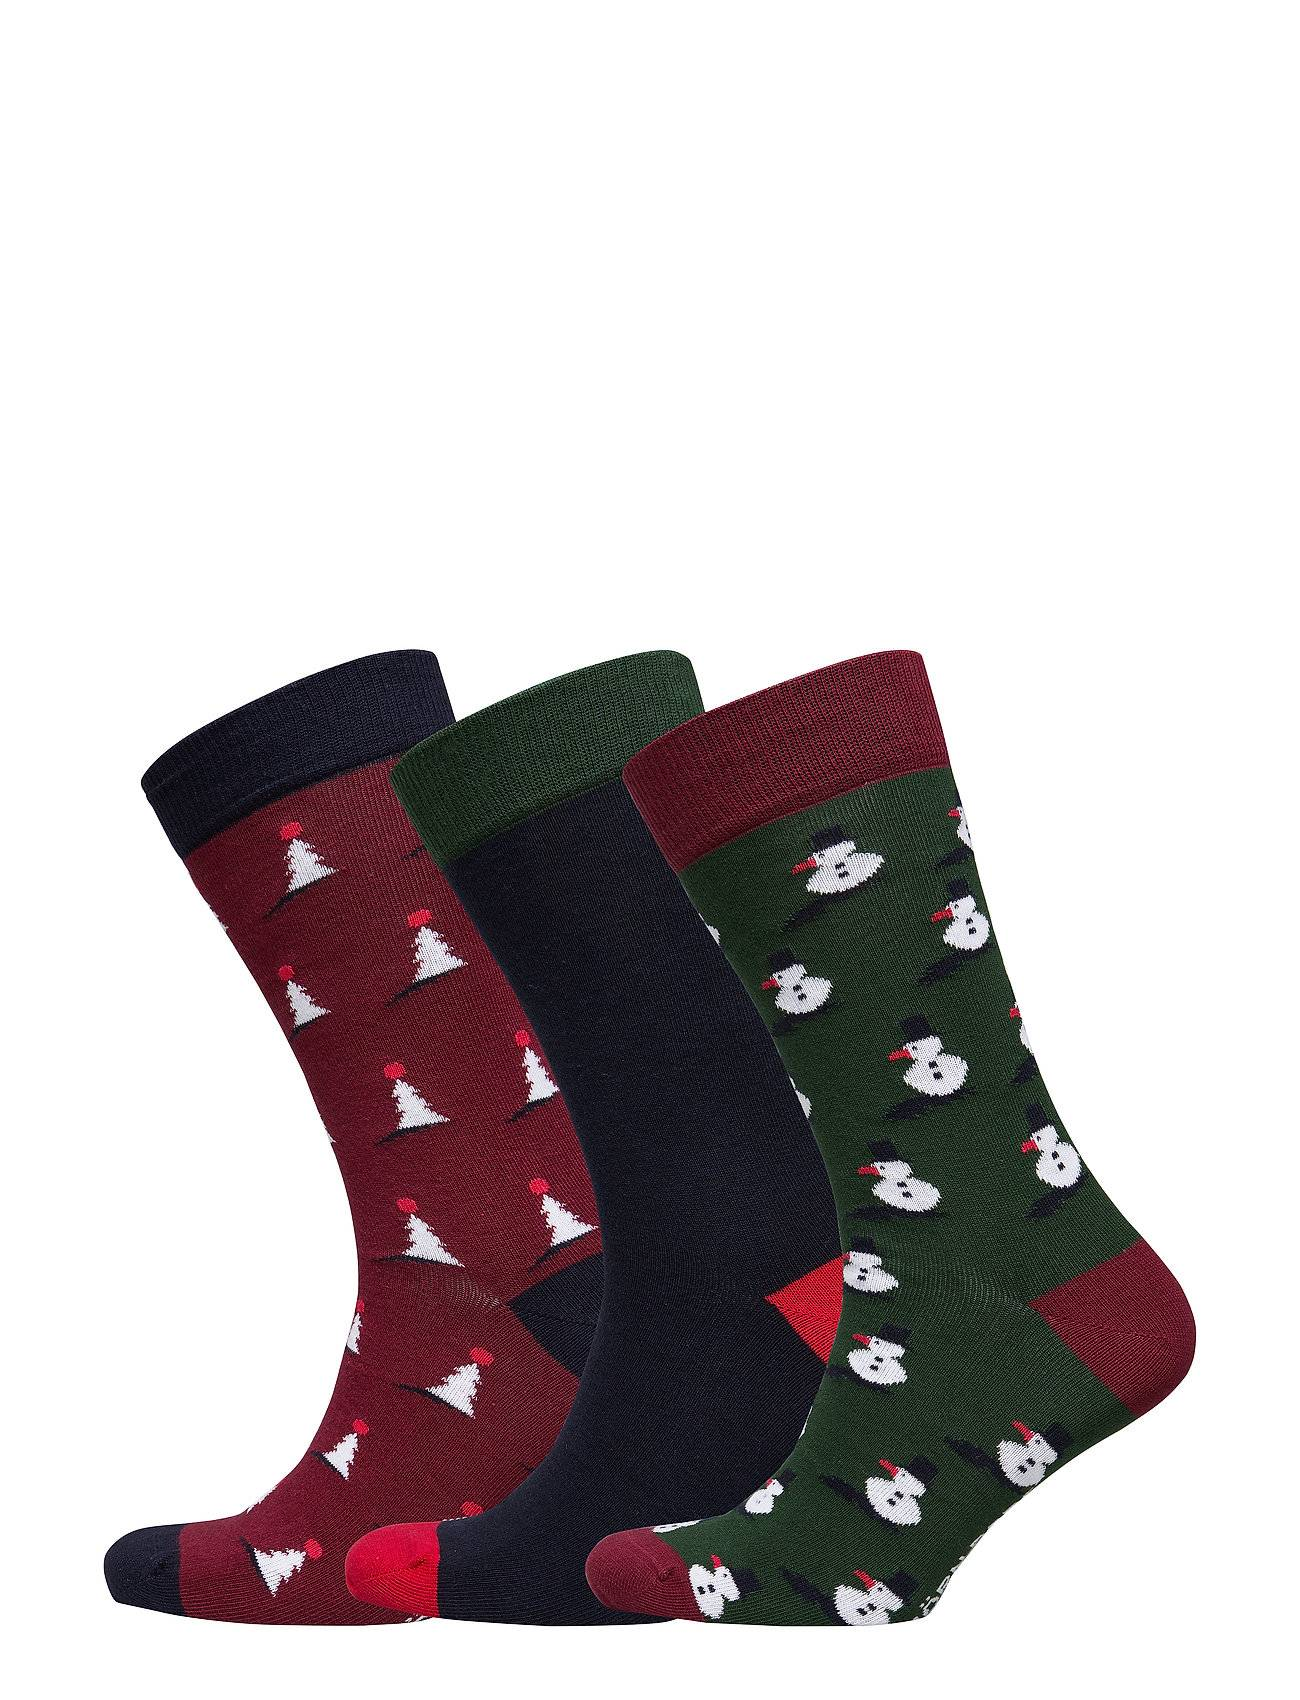 Björn Borg G Sock Bb X-Mas-Tree Xmas-Box 3p Underwear Socks Regular Socks Monivärinen/Kuvioitu Björn Borg